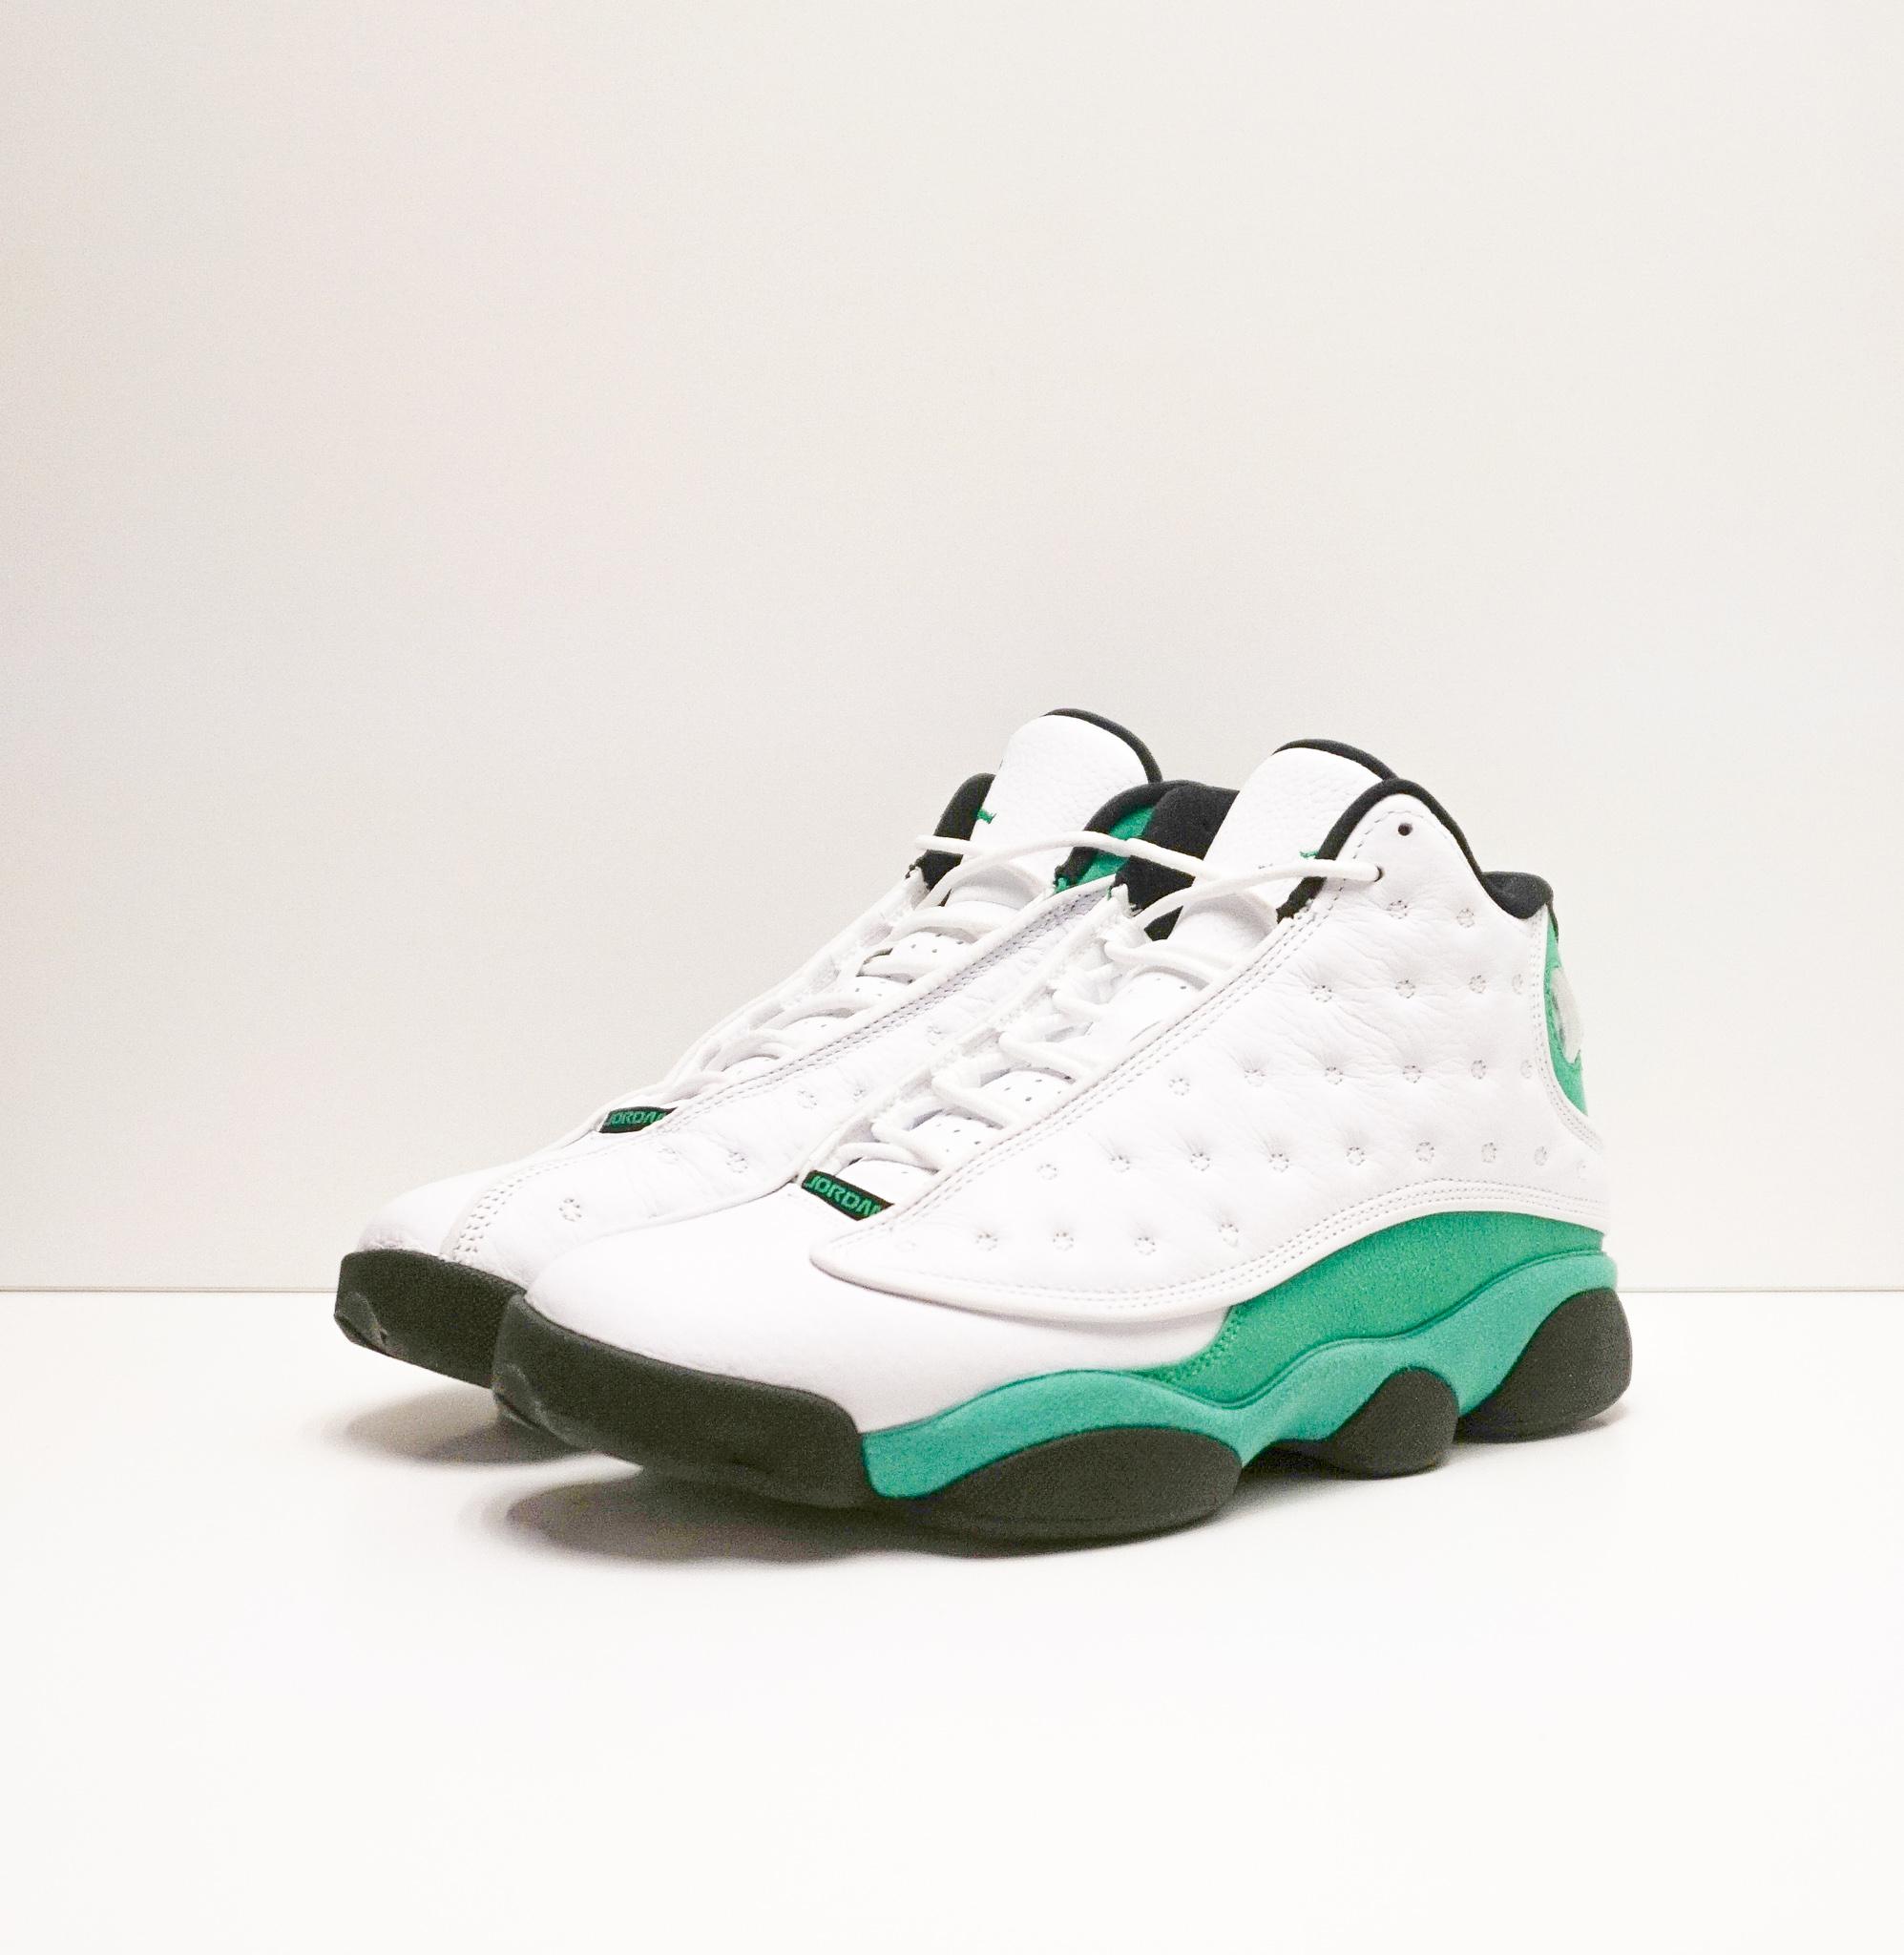 Jordan 13 Retro White Lucky Green